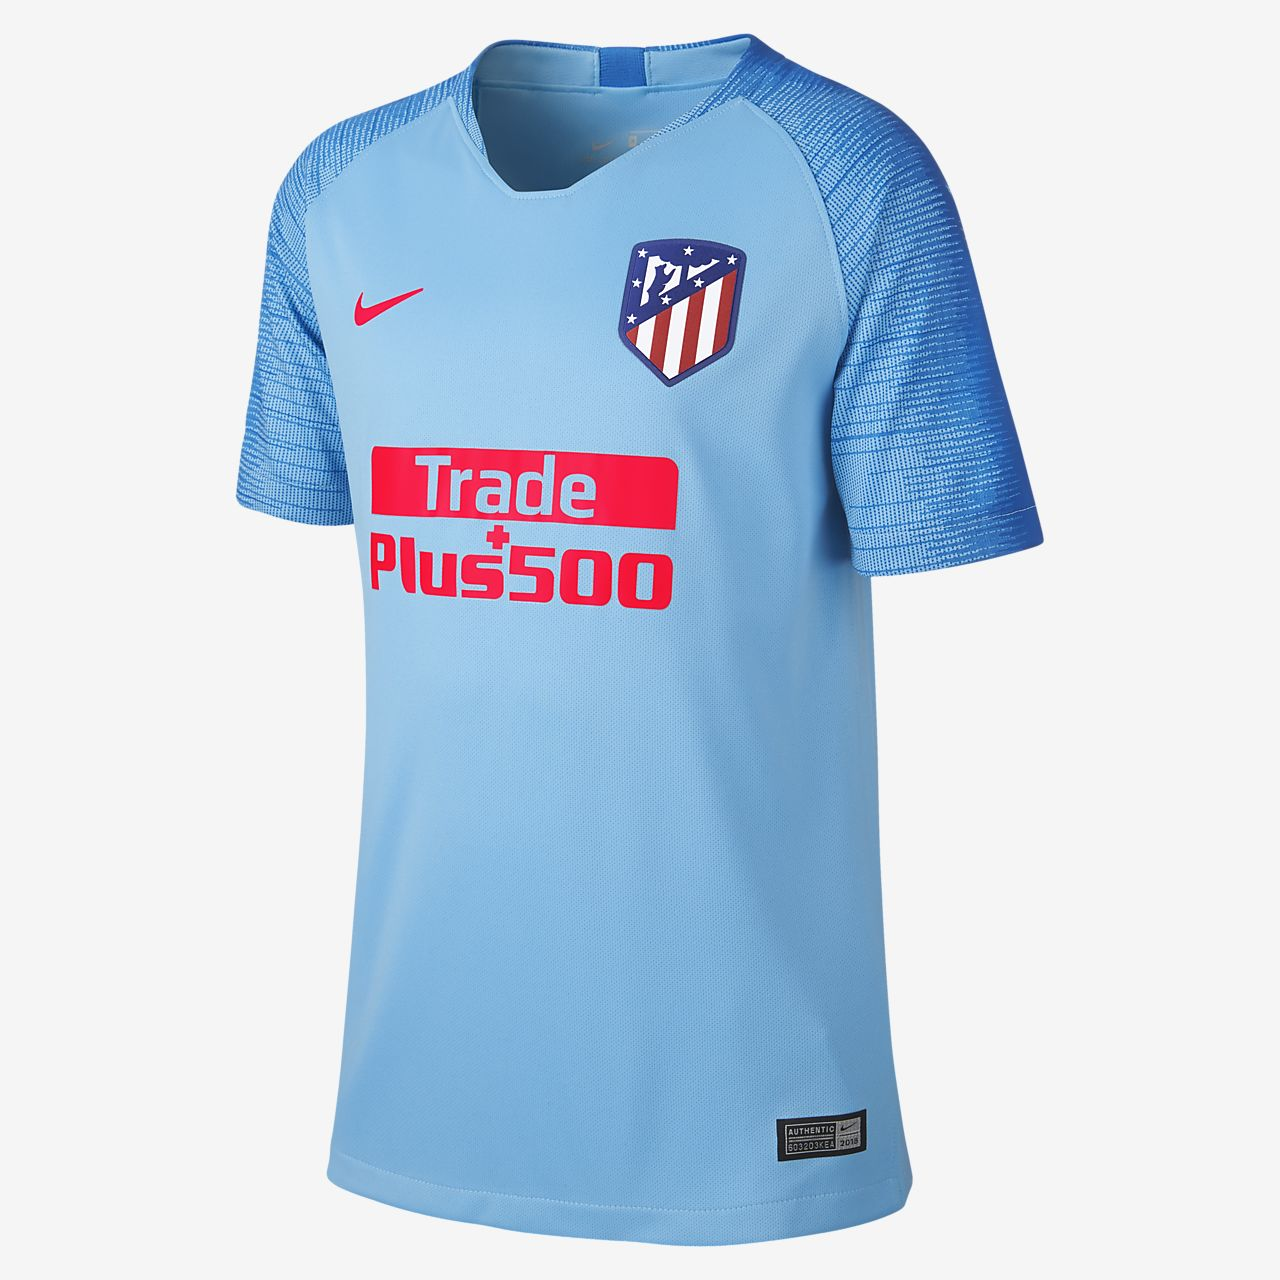 5fa425a6c01 2018/19 Atlético de Madrid Stadium Away Older Kids' Football Shirt ...